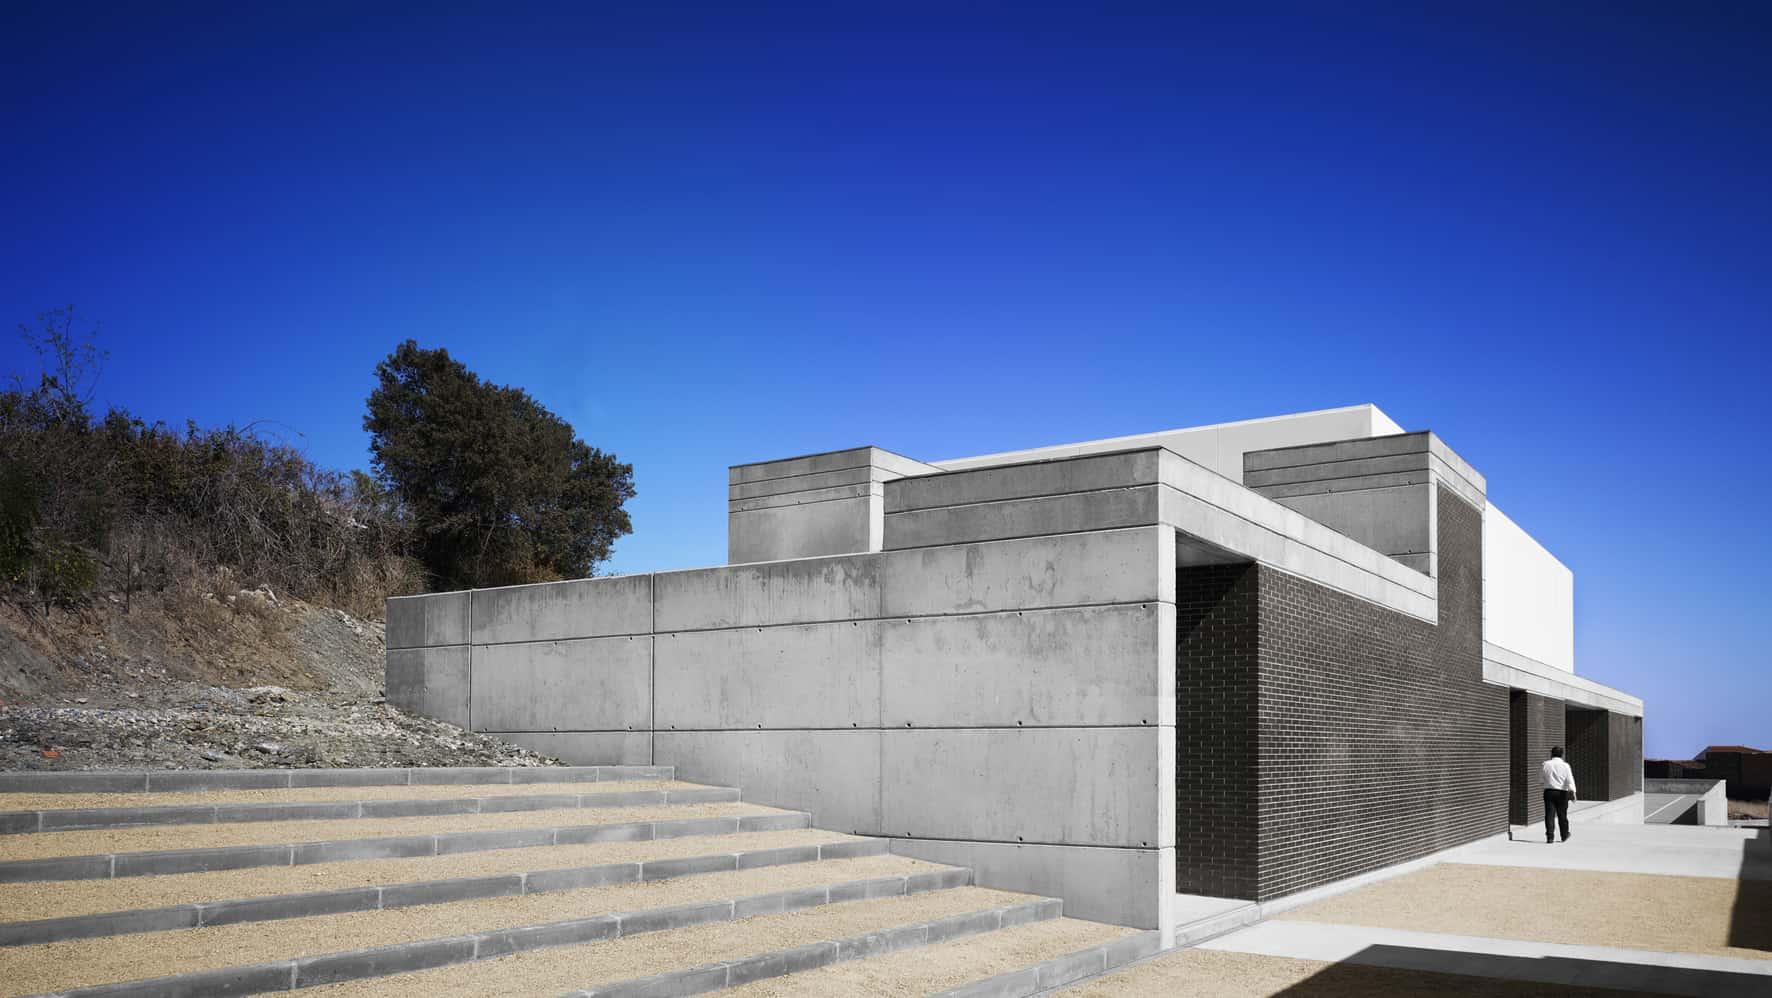 Pabellón Malpartida - arquitectura extremadura - LANDINEZ+REY | equipo L2G arquitectos, [eL2Gaa]